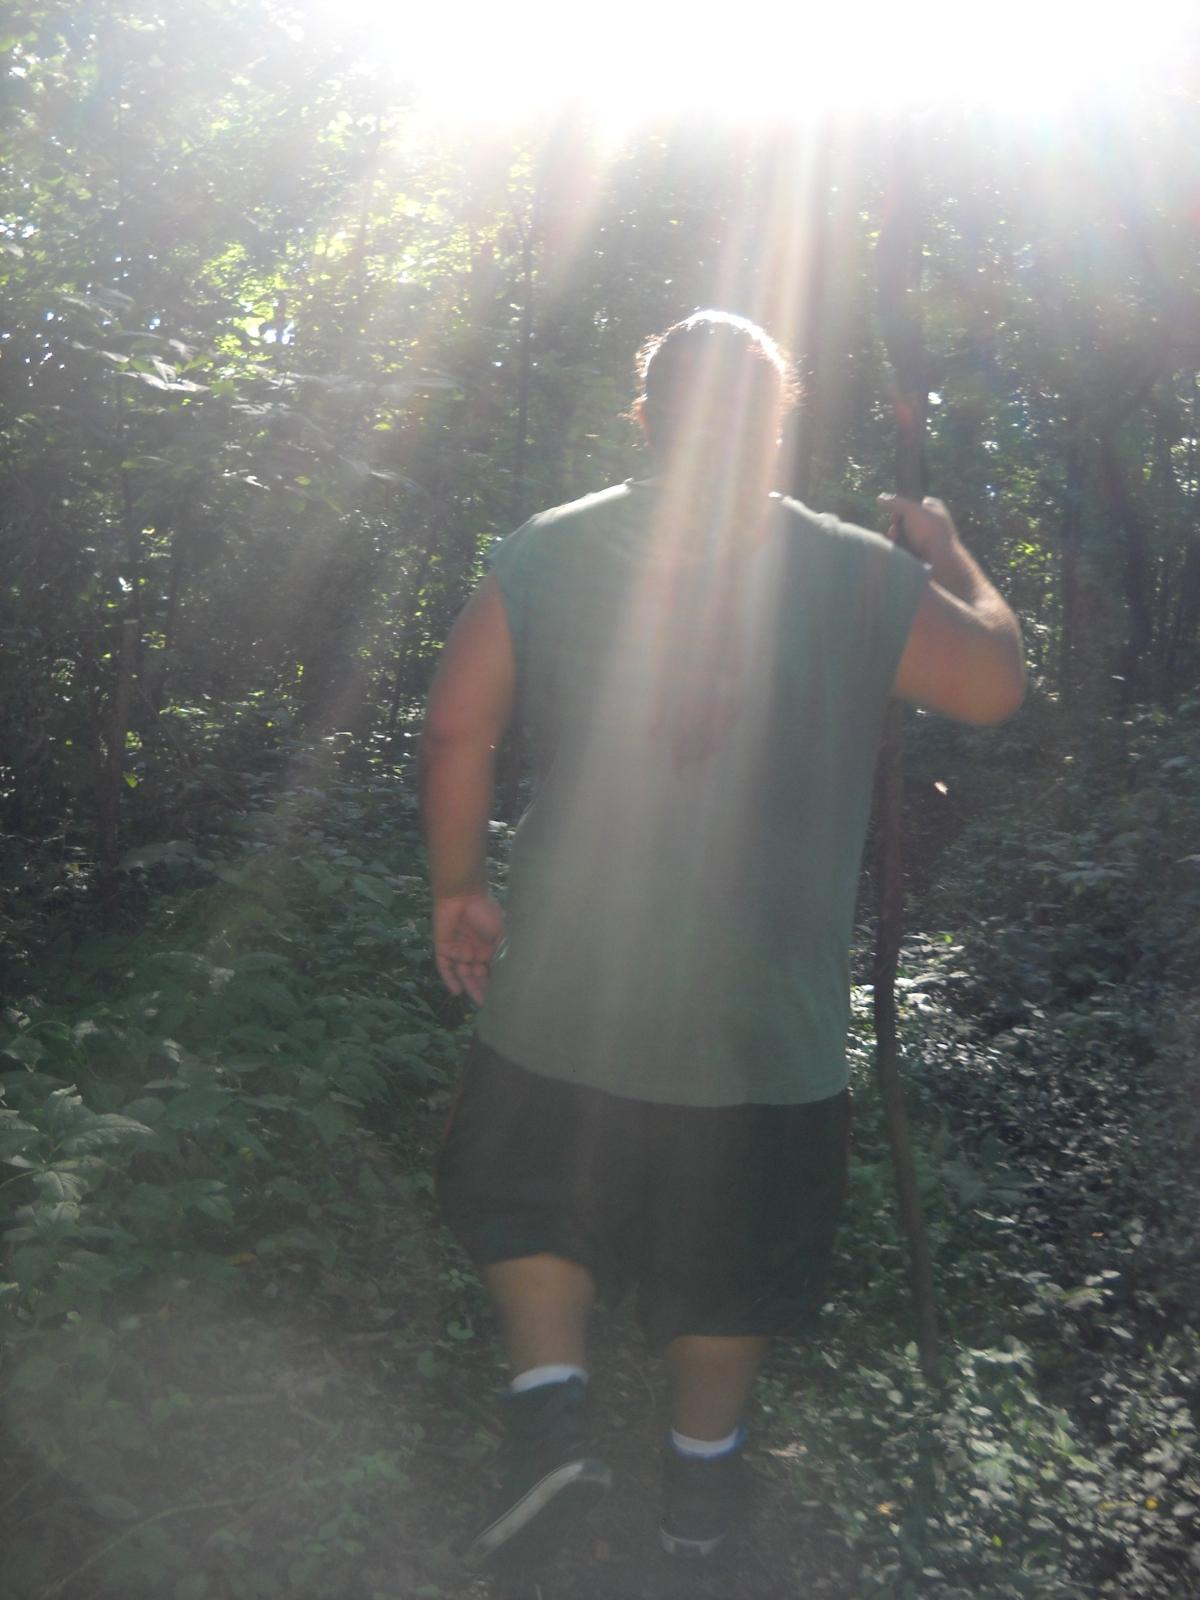 Day 30 of 30 Photo Challenge: Sun Flare